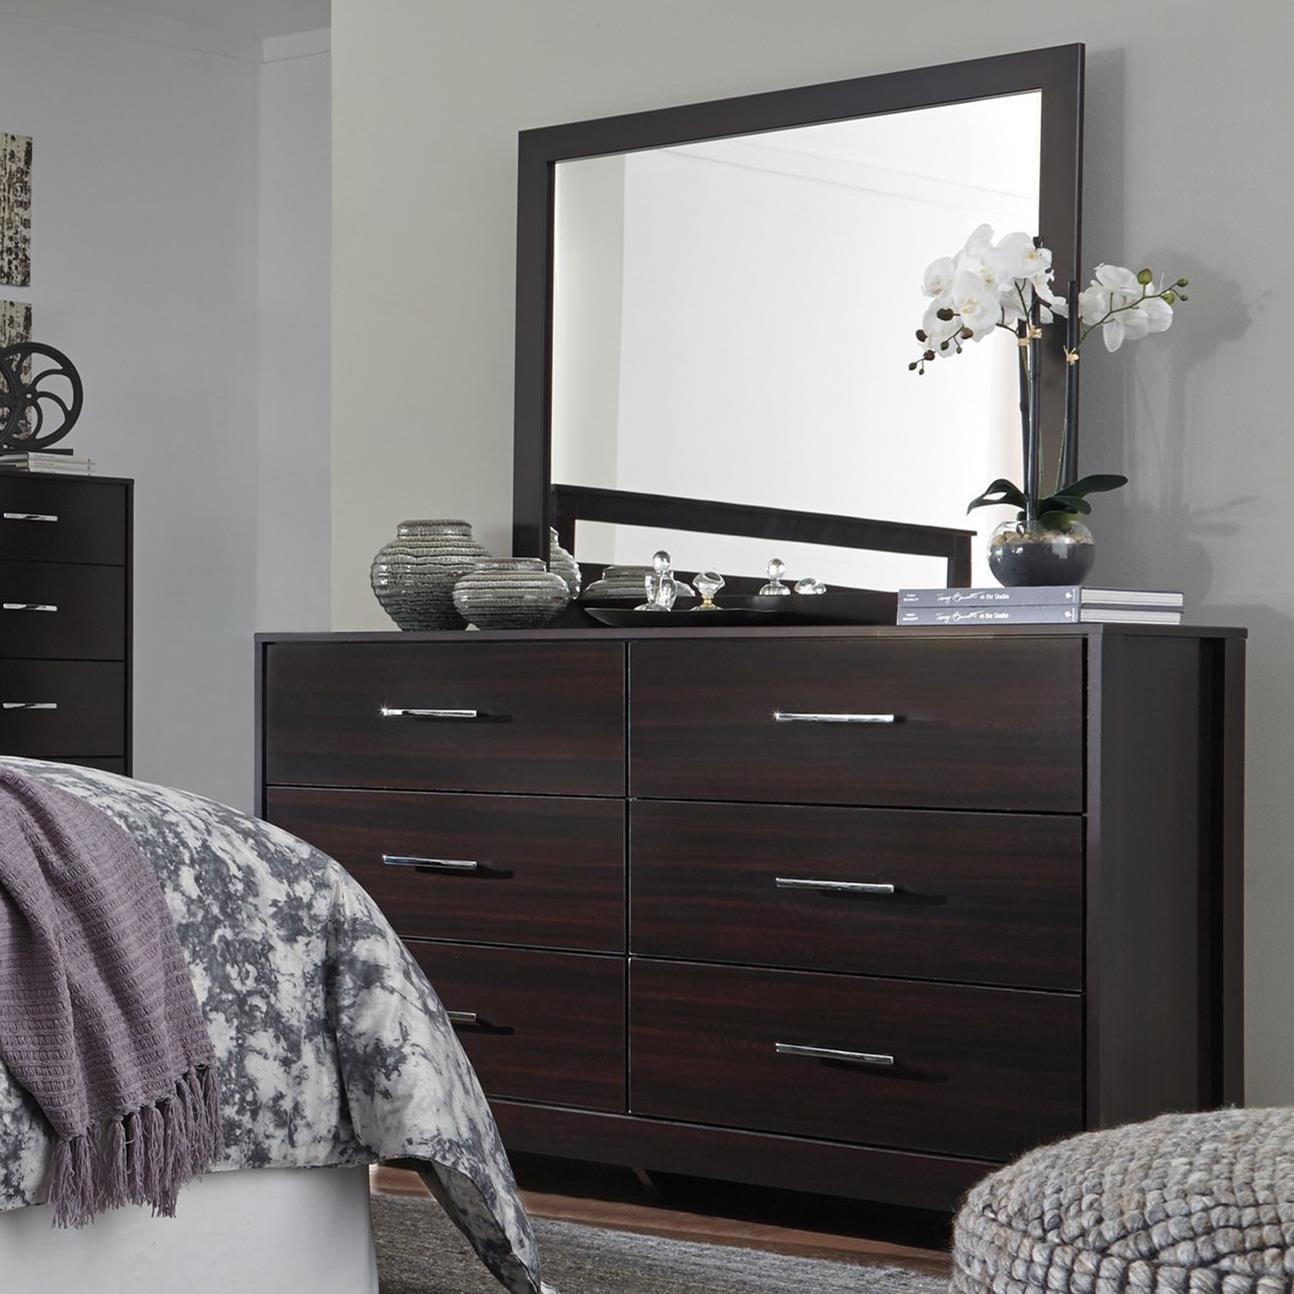 Signature Design by Ashley Agella Dresser & Bedroom Mirror - Item Number: B072-31+36